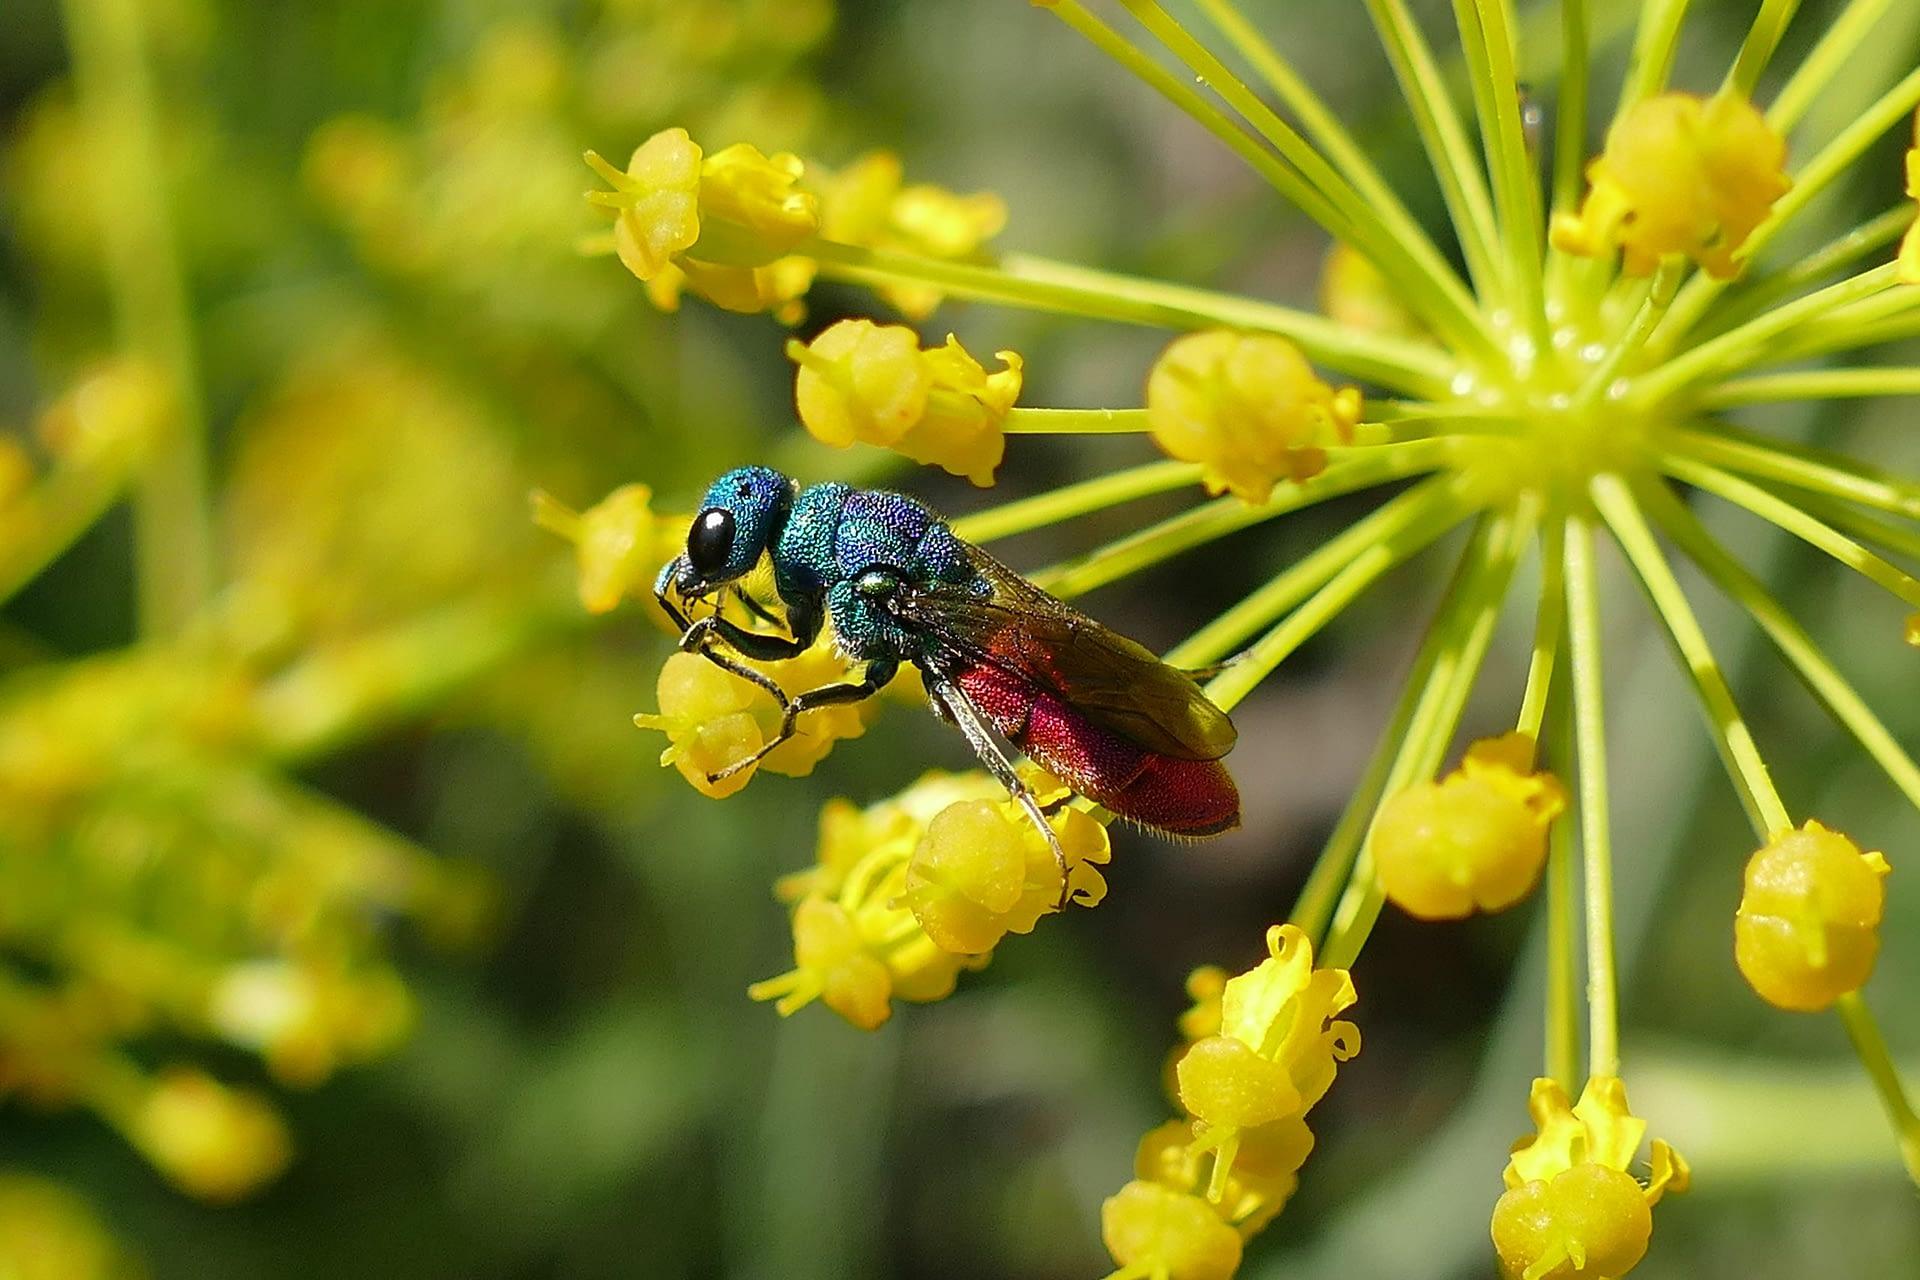 Chrysis spec. (Hymenoptera: Chrysidae) sobre Cañareja Thapsia villosa.